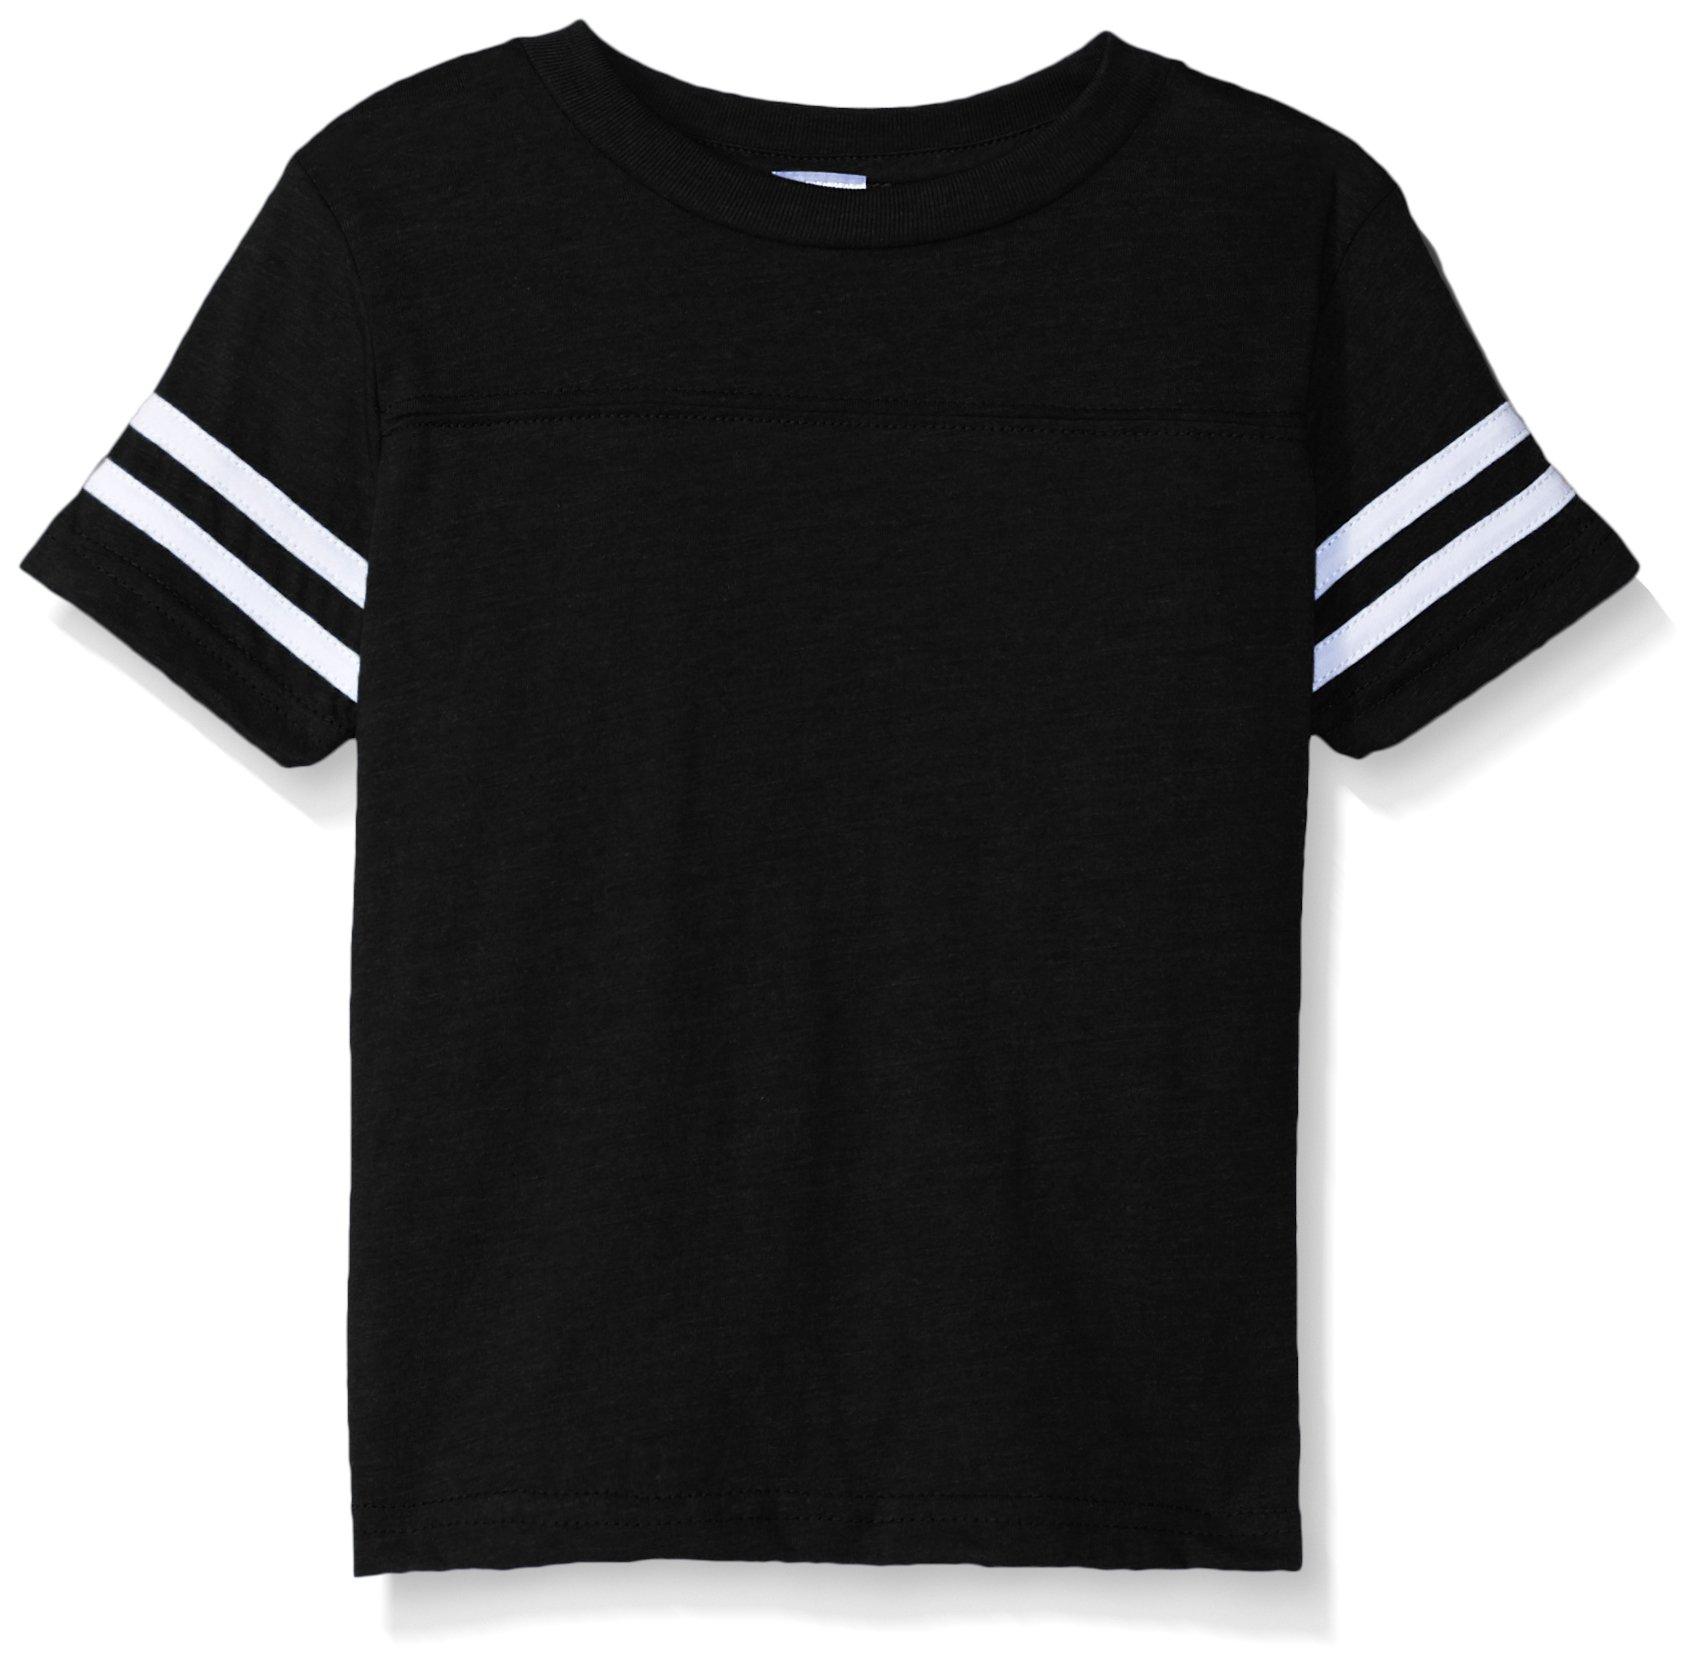 Clementine Toddler Kids Football Fine Jersey T-Shirt, Black/White, 2T